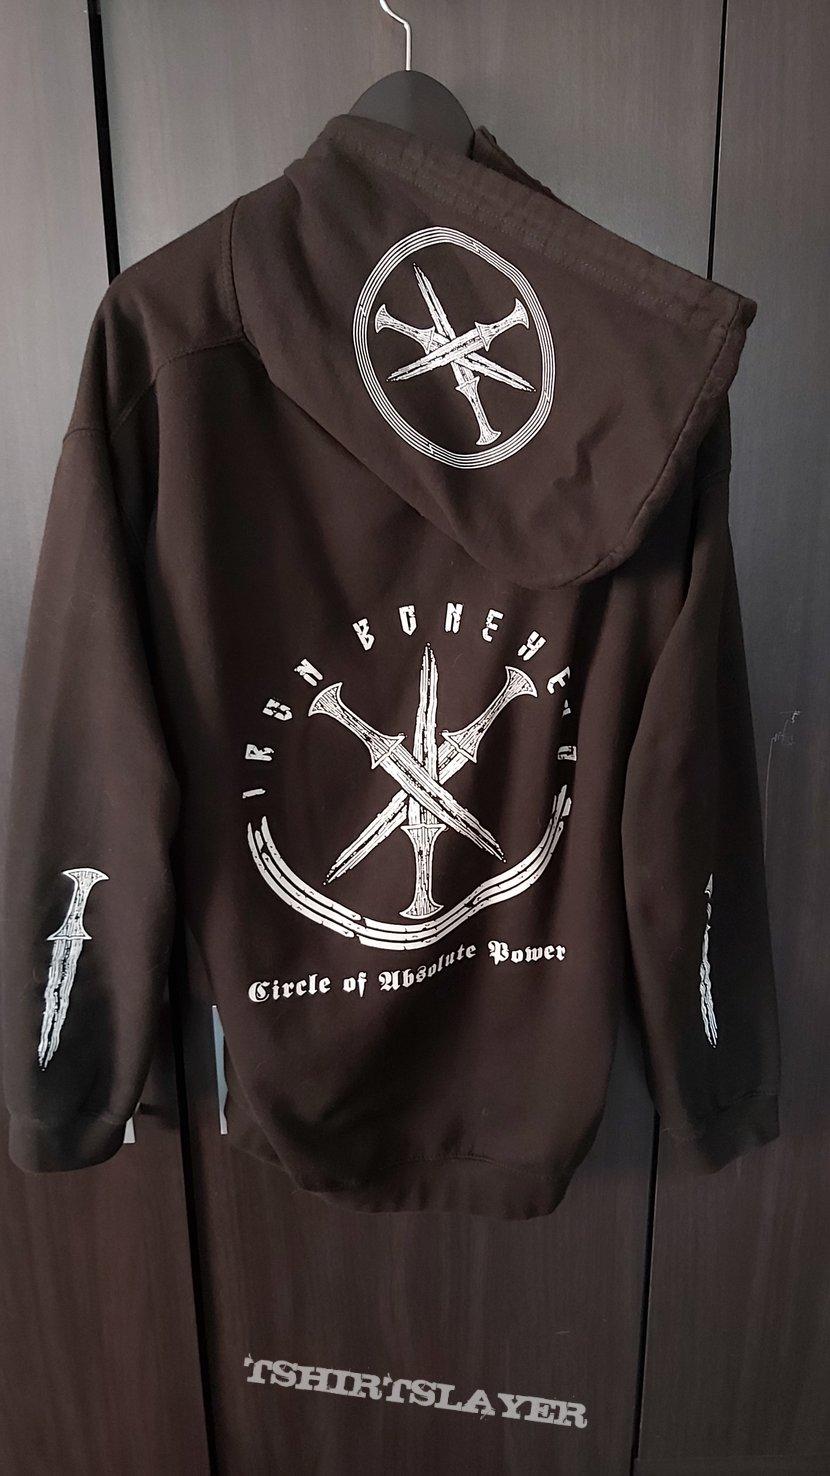 Iron Bonehead Circle of Absolute Power Zipped Hoodie XL